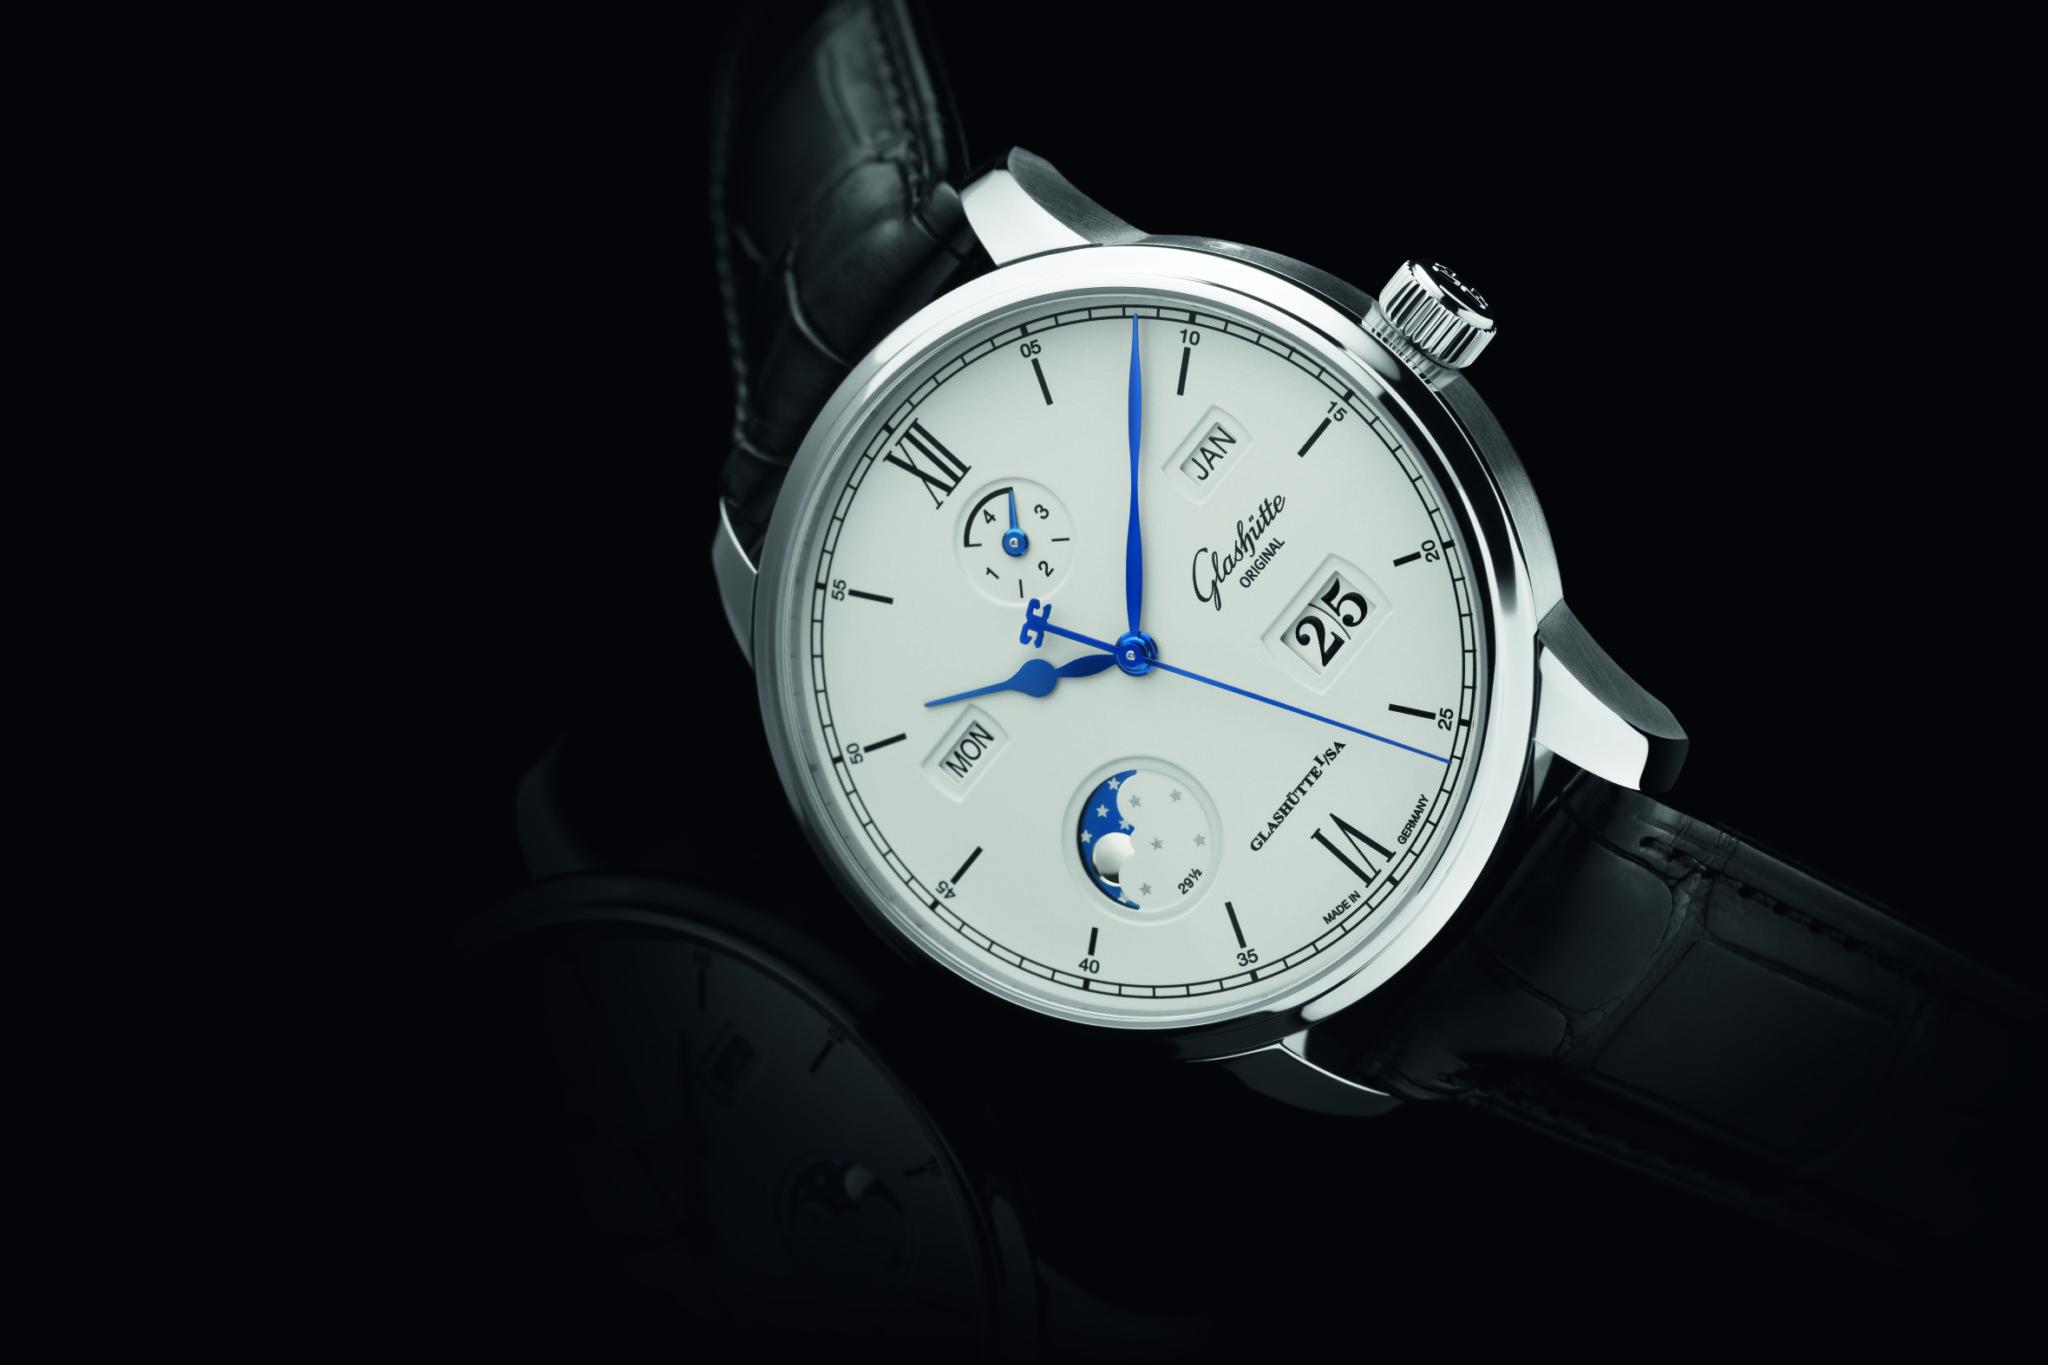 Glashutte Original's Senator Excellence Perpetual Calendar demonstrates classical German watchmaking design and engineering.